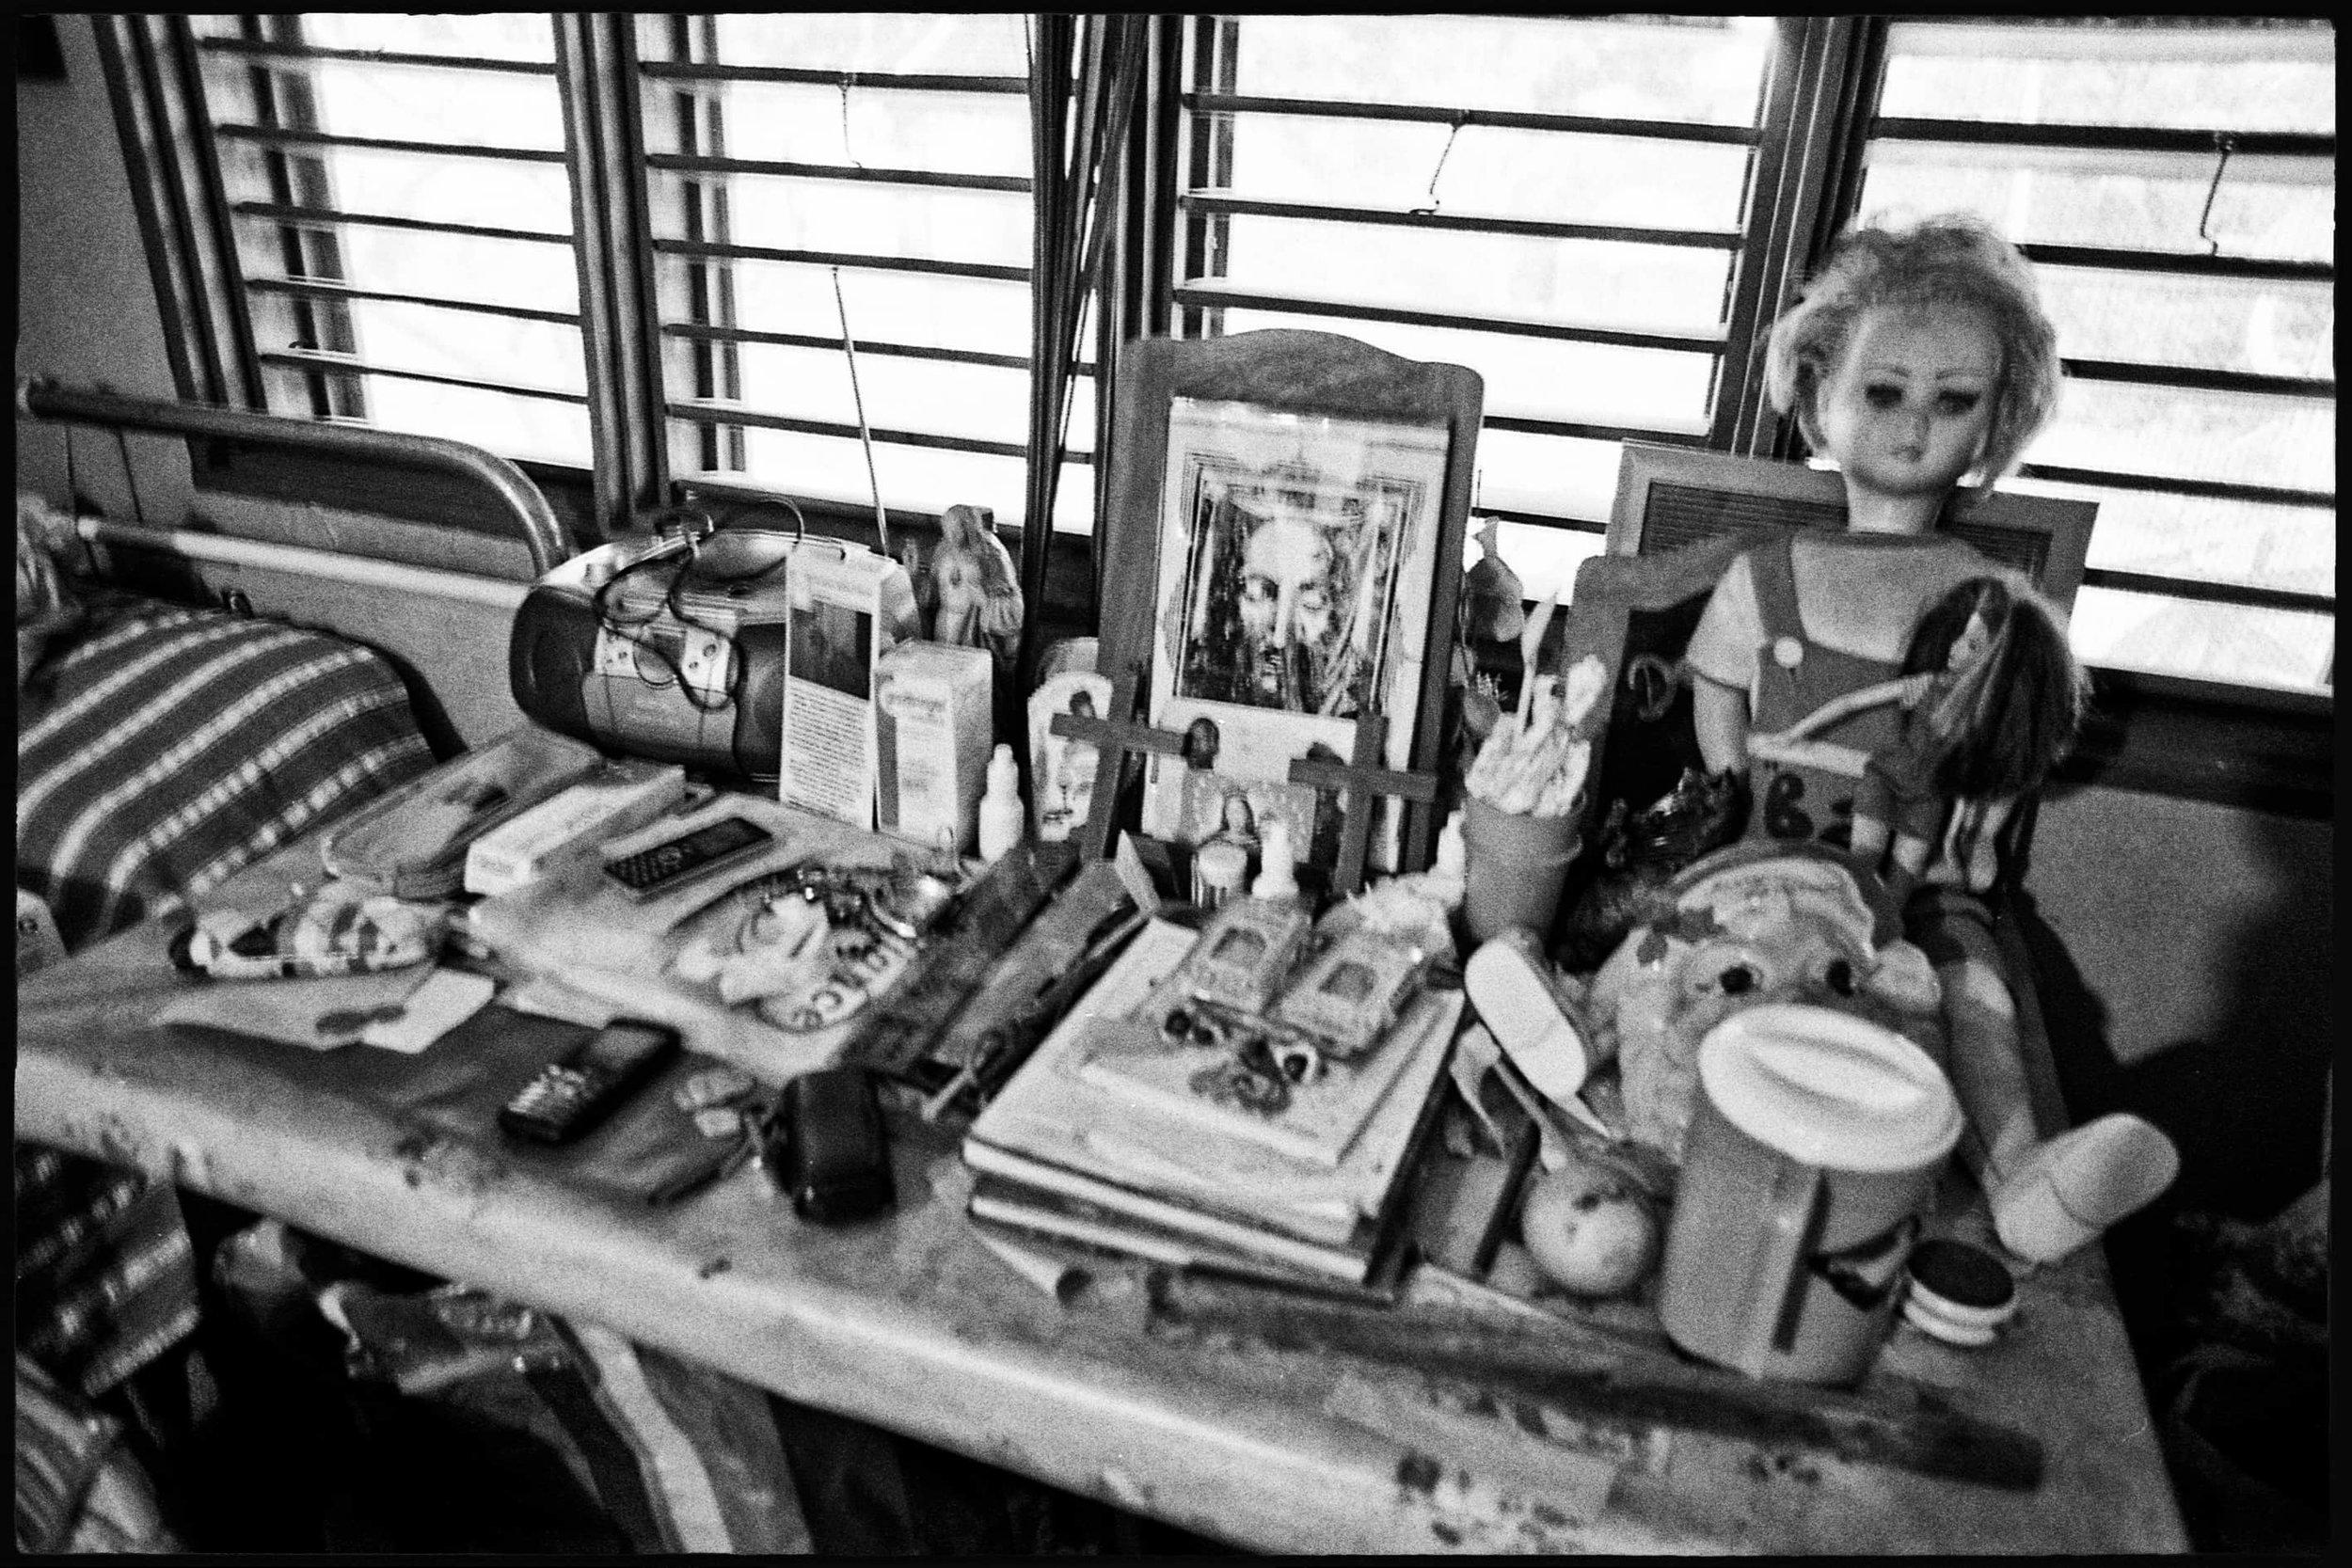 documentary-reportage-centre-les-archanges-fabio-burrelli-13.jpg